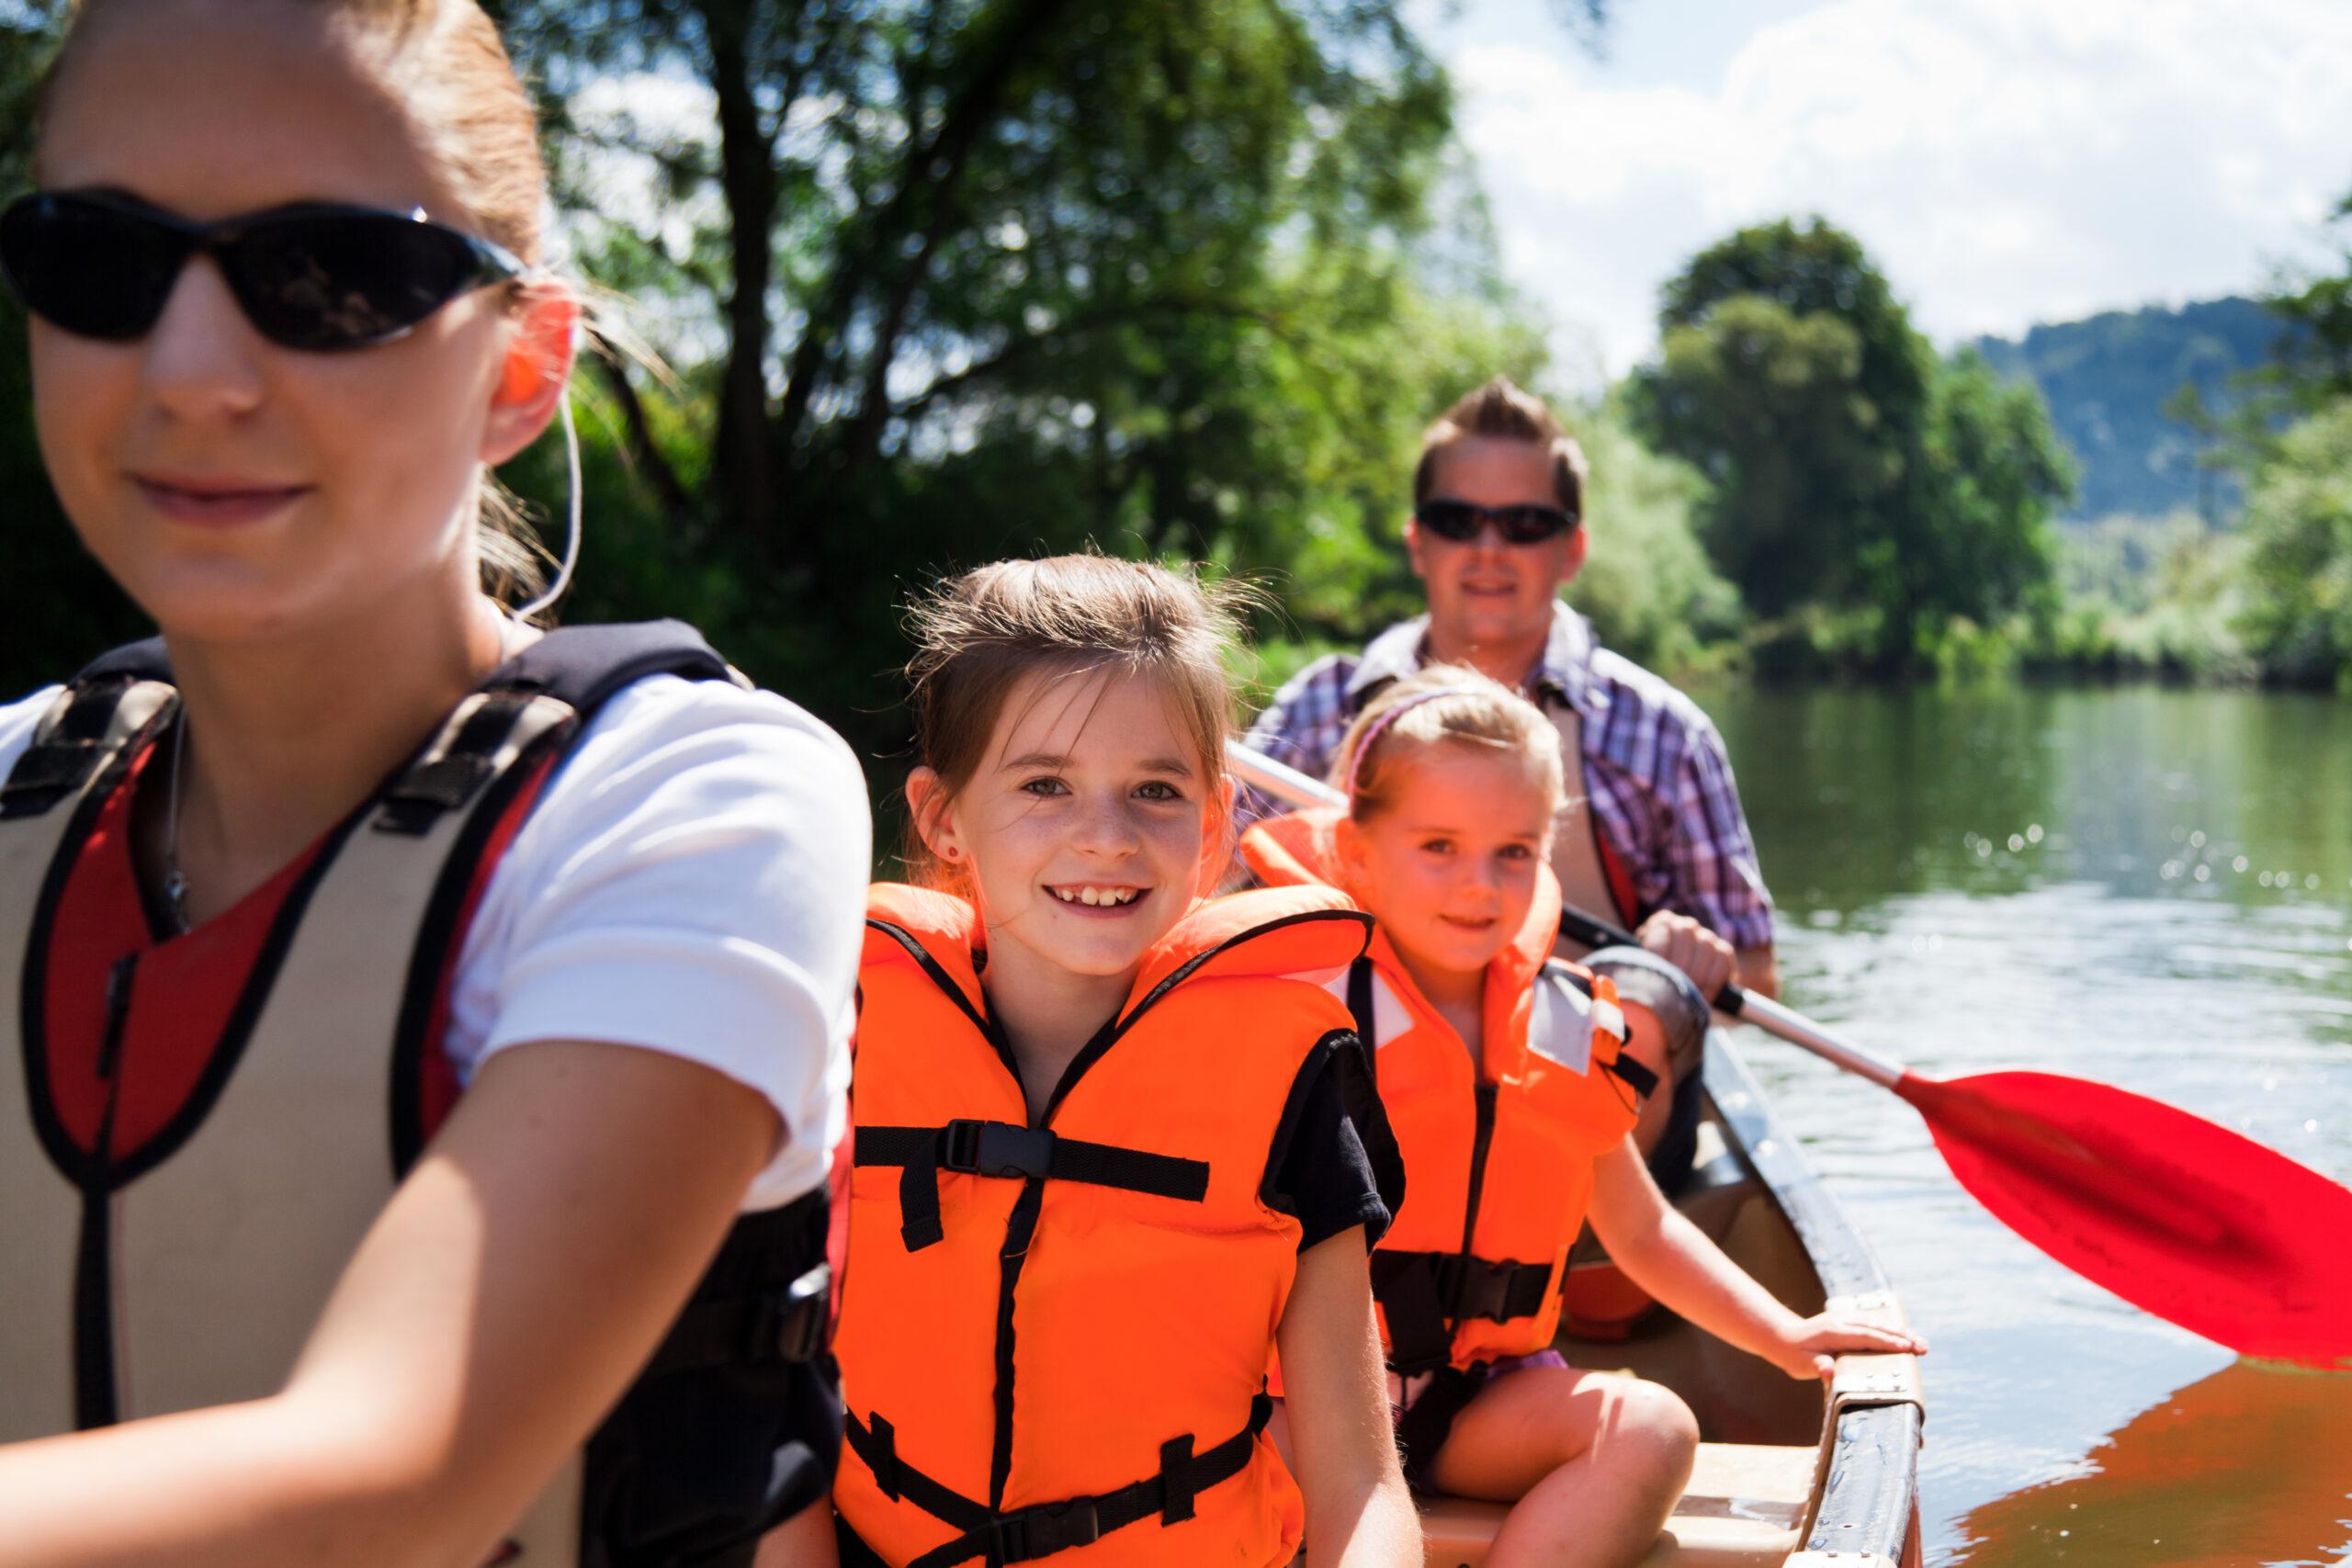 Porters Heath Family on Water